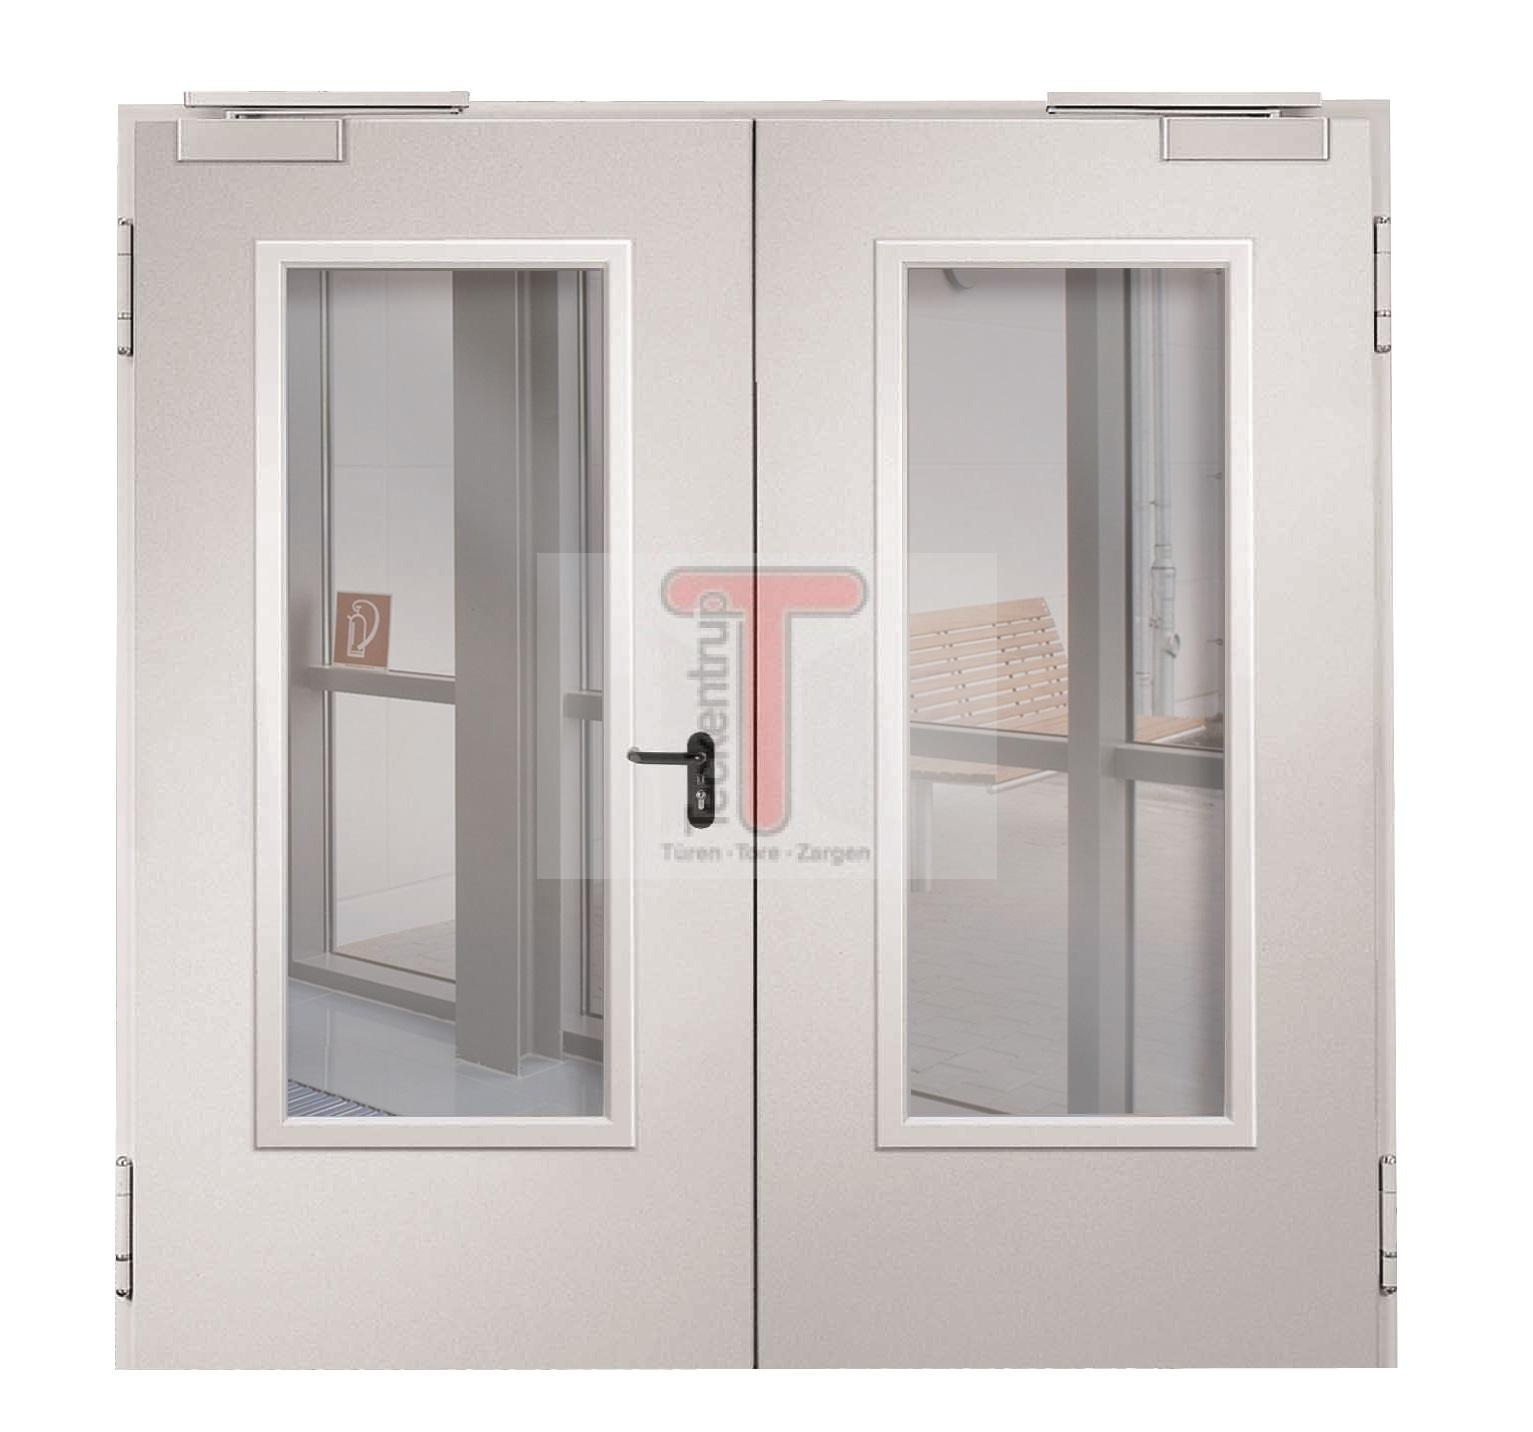 1750x2125 links t30 fsa 62 glas brandschutzglas brandschutzt r t r teckentrup ebay. Black Bedroom Furniture Sets. Home Design Ideas